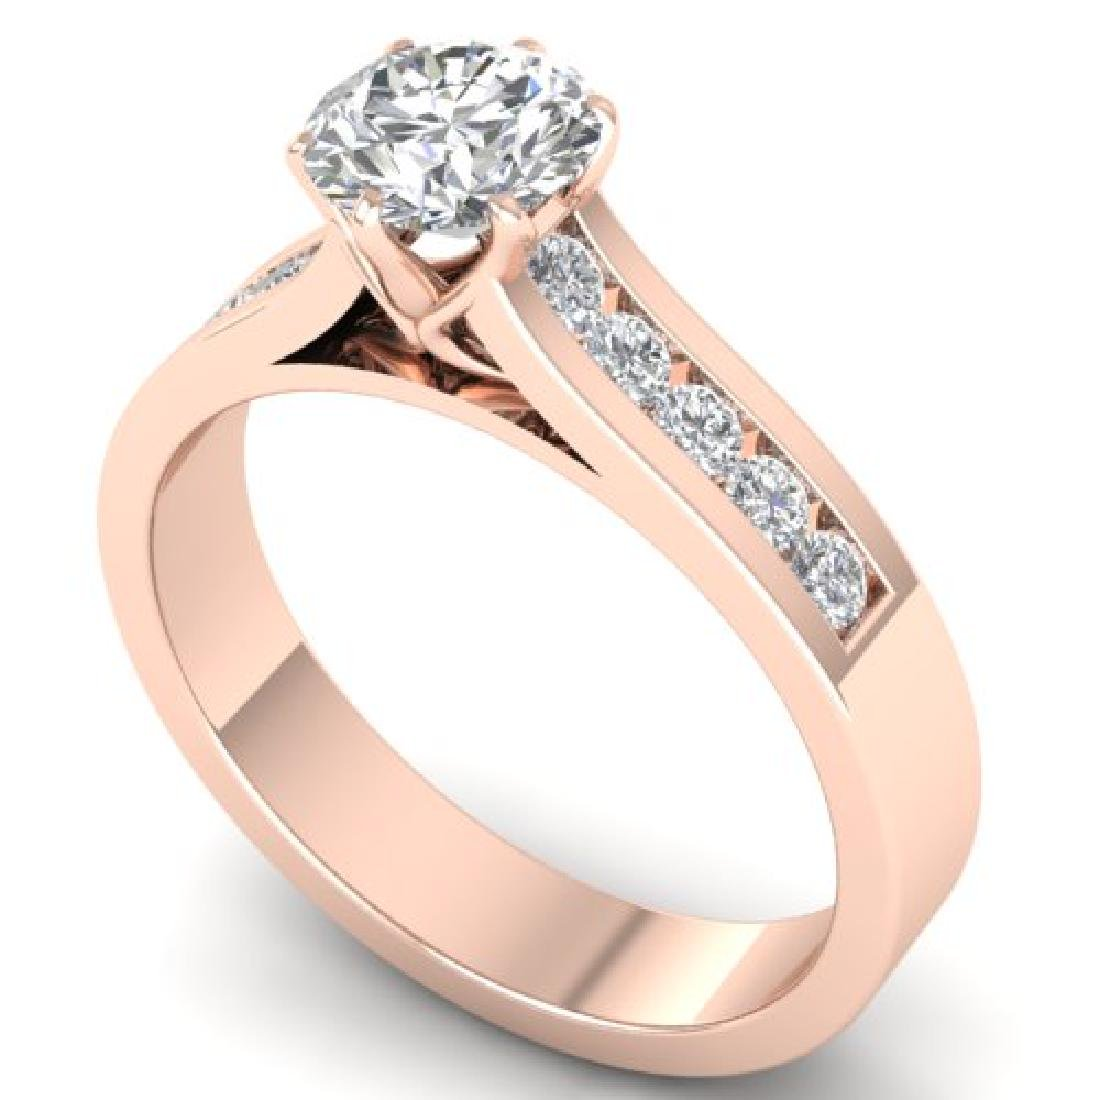 1.1 CTW Certified VS/SI Diamond Solitaire Art Deco Ring - 2